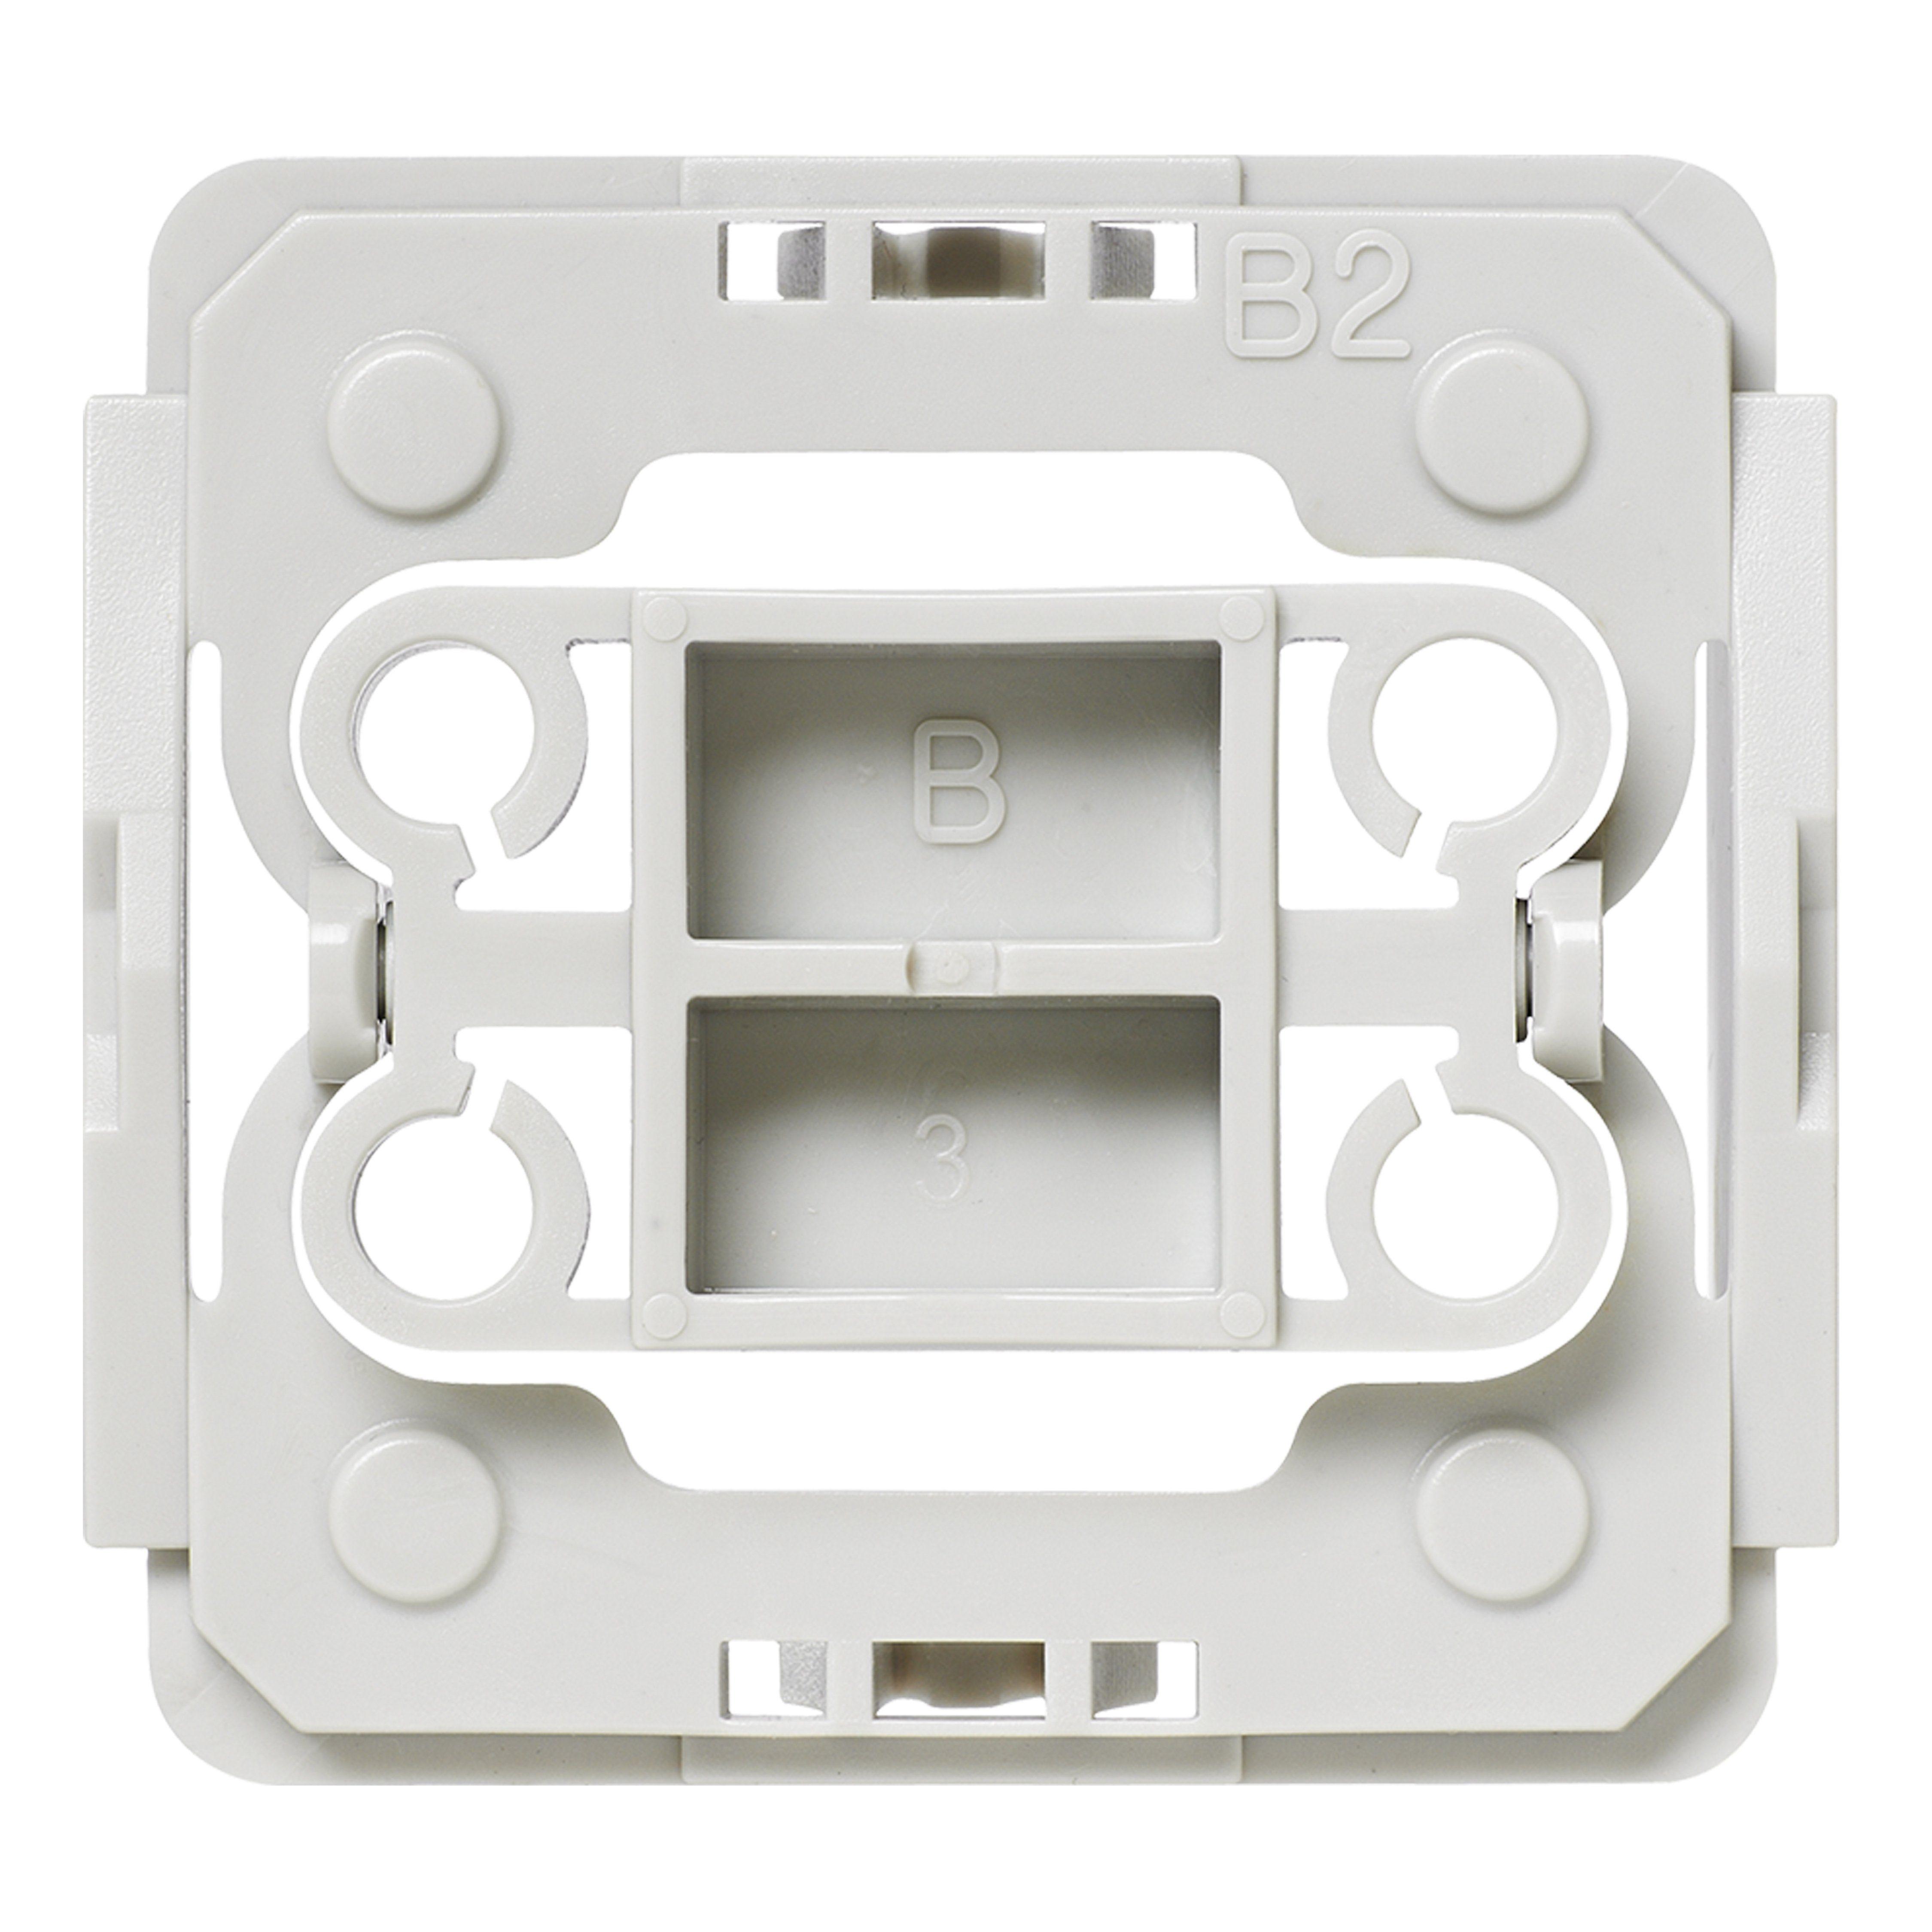 homematic IP Smart Home - Adapter für Markenschalter Berker 2 »EQ3-ADA-B2«